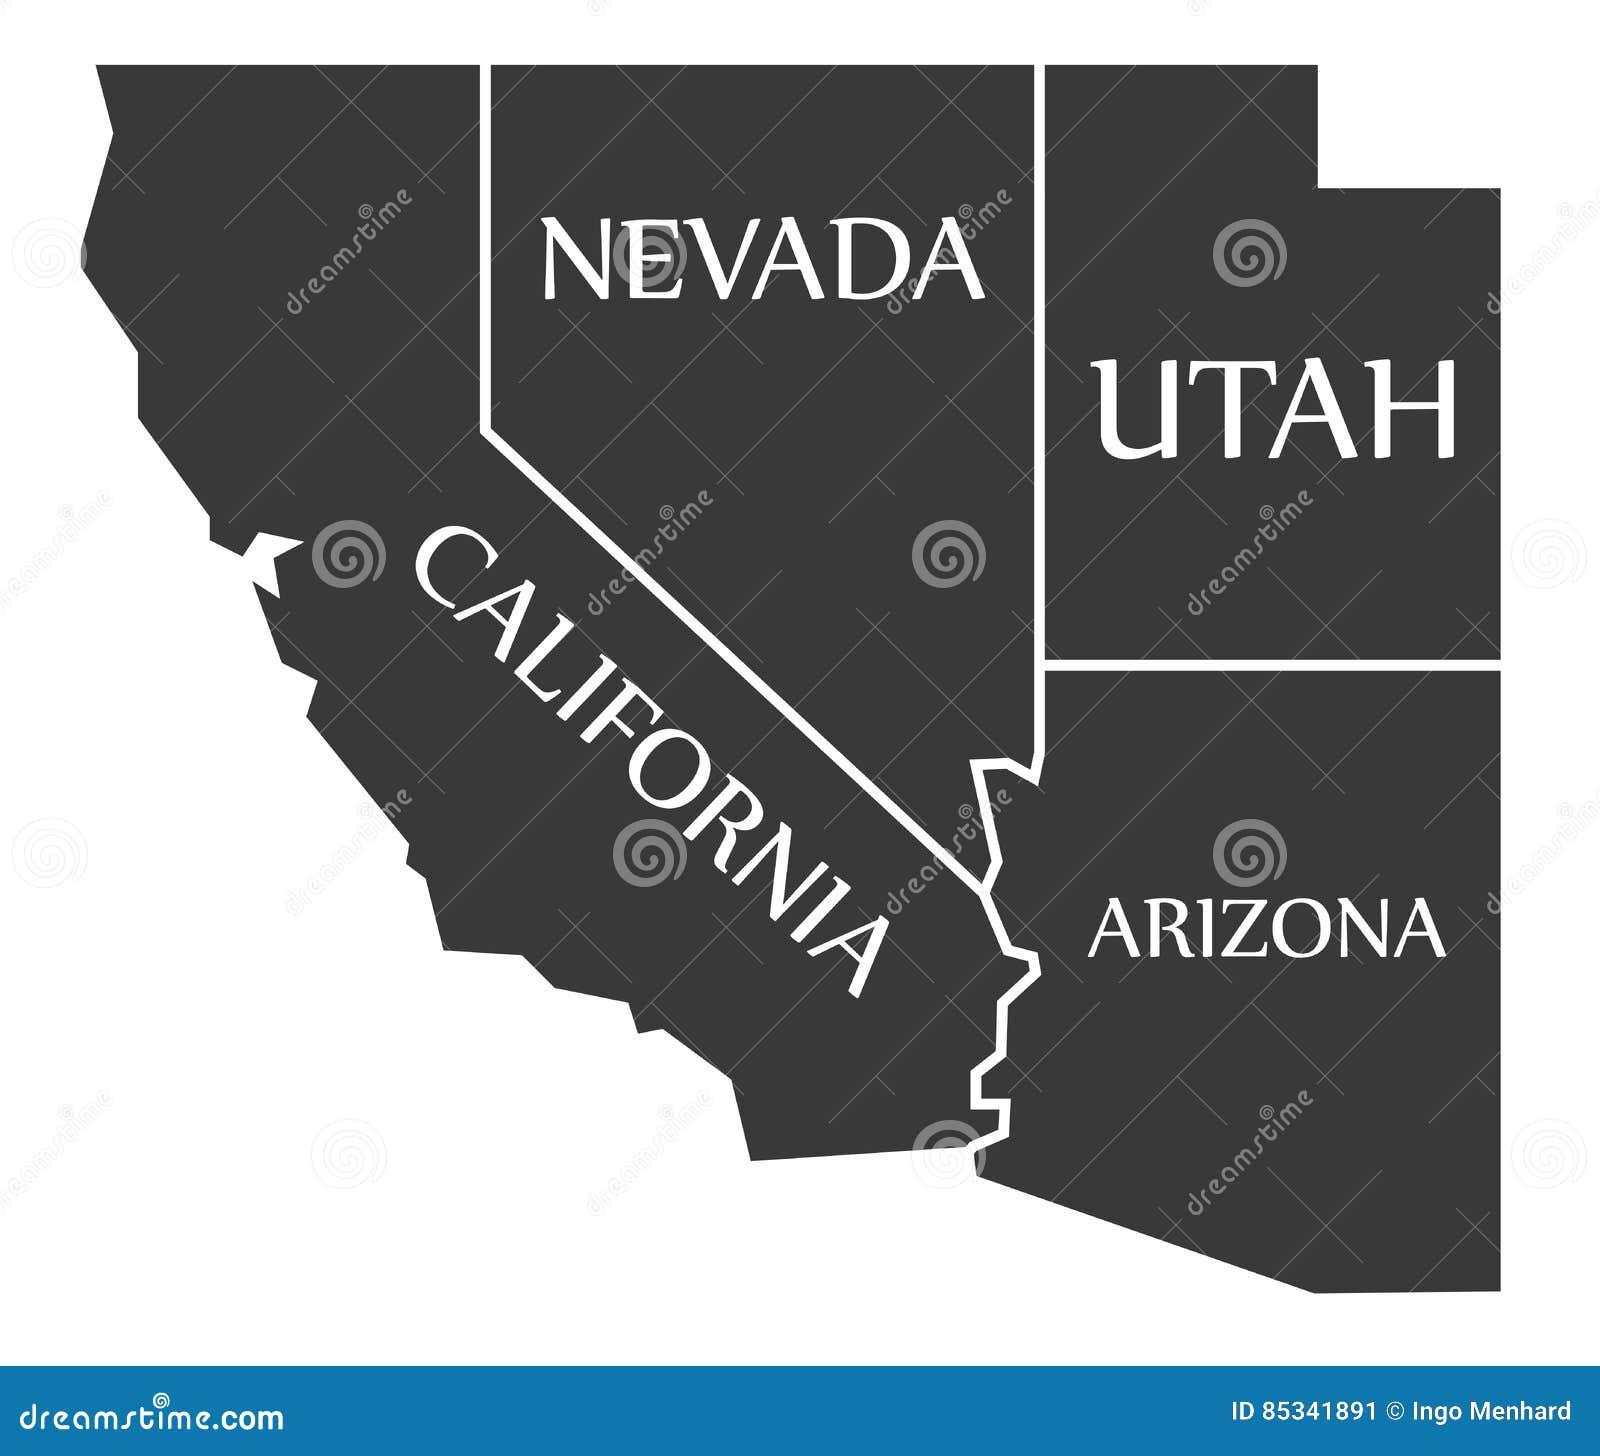 Map Of Nevada Arizona.California Nevada Utah Arizona Map Labelled Black Stock